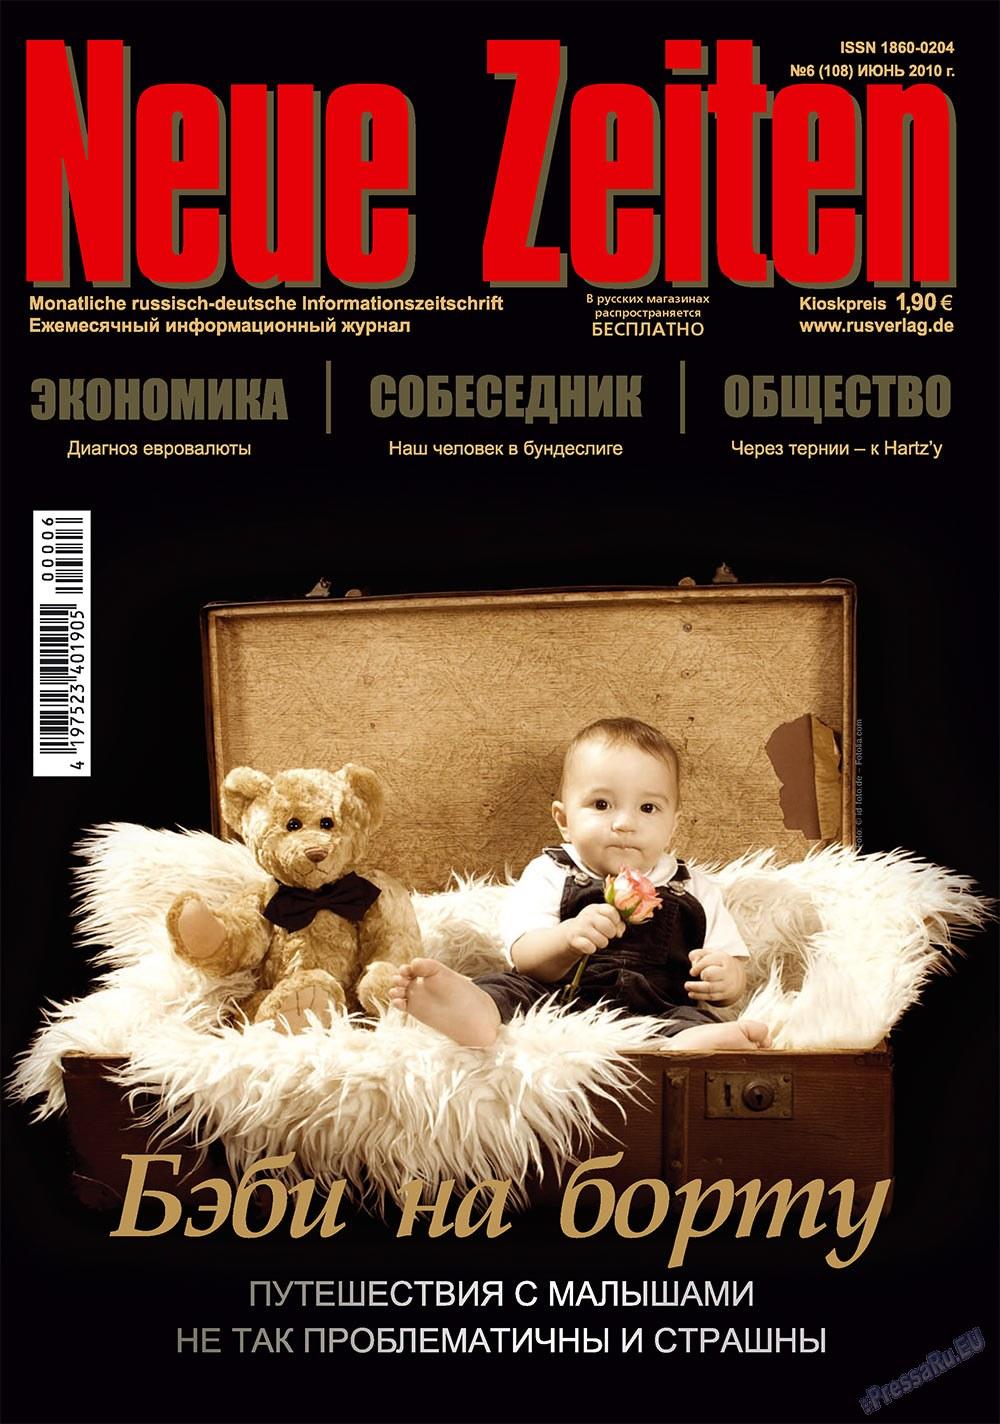 Neue Zeiten (журнал). 2010 год, номер 6, стр. 1